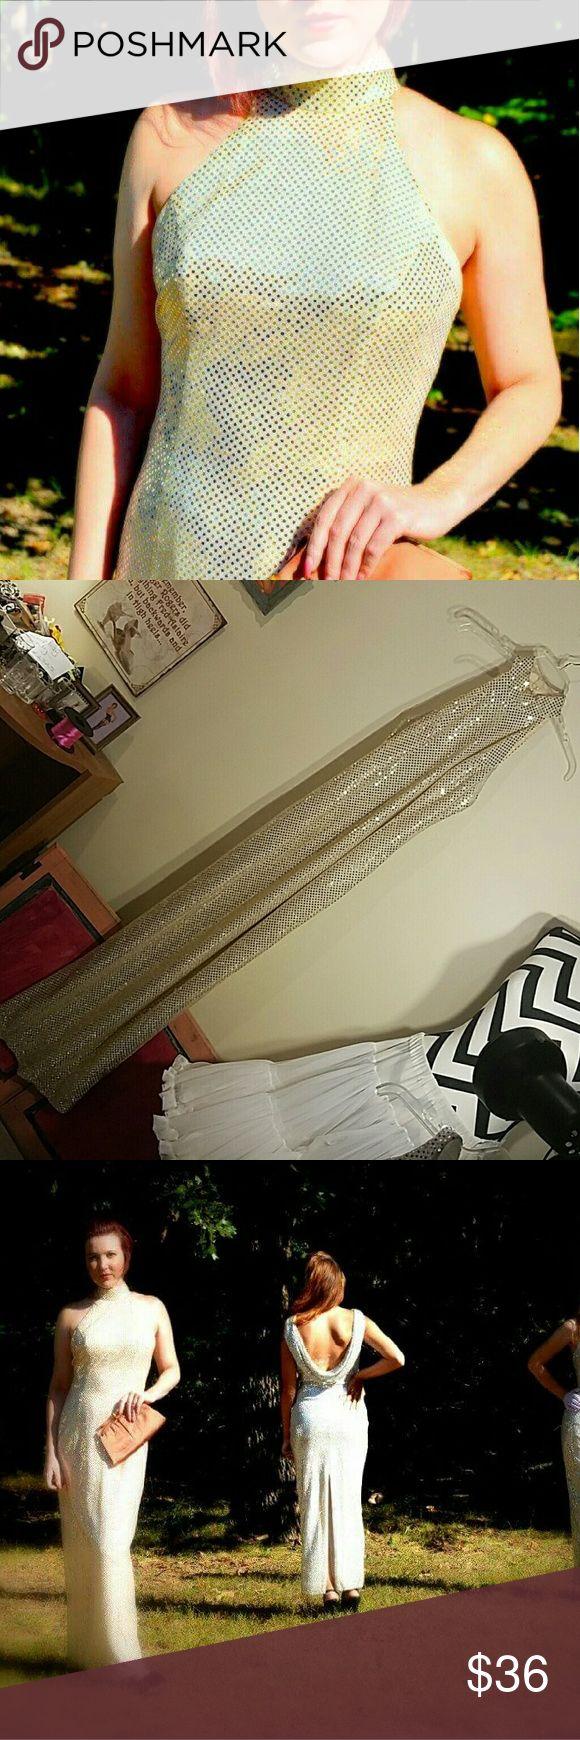 Stunning Sparkling Floor Length Flapper Dress Retro piece.   Size 7/8 Gold Low cut dip down back Choker bodice cut  Slit up the back Bust 32 Waist 28 Hips 34 Hand wash only. Roberta Dresses Maxi